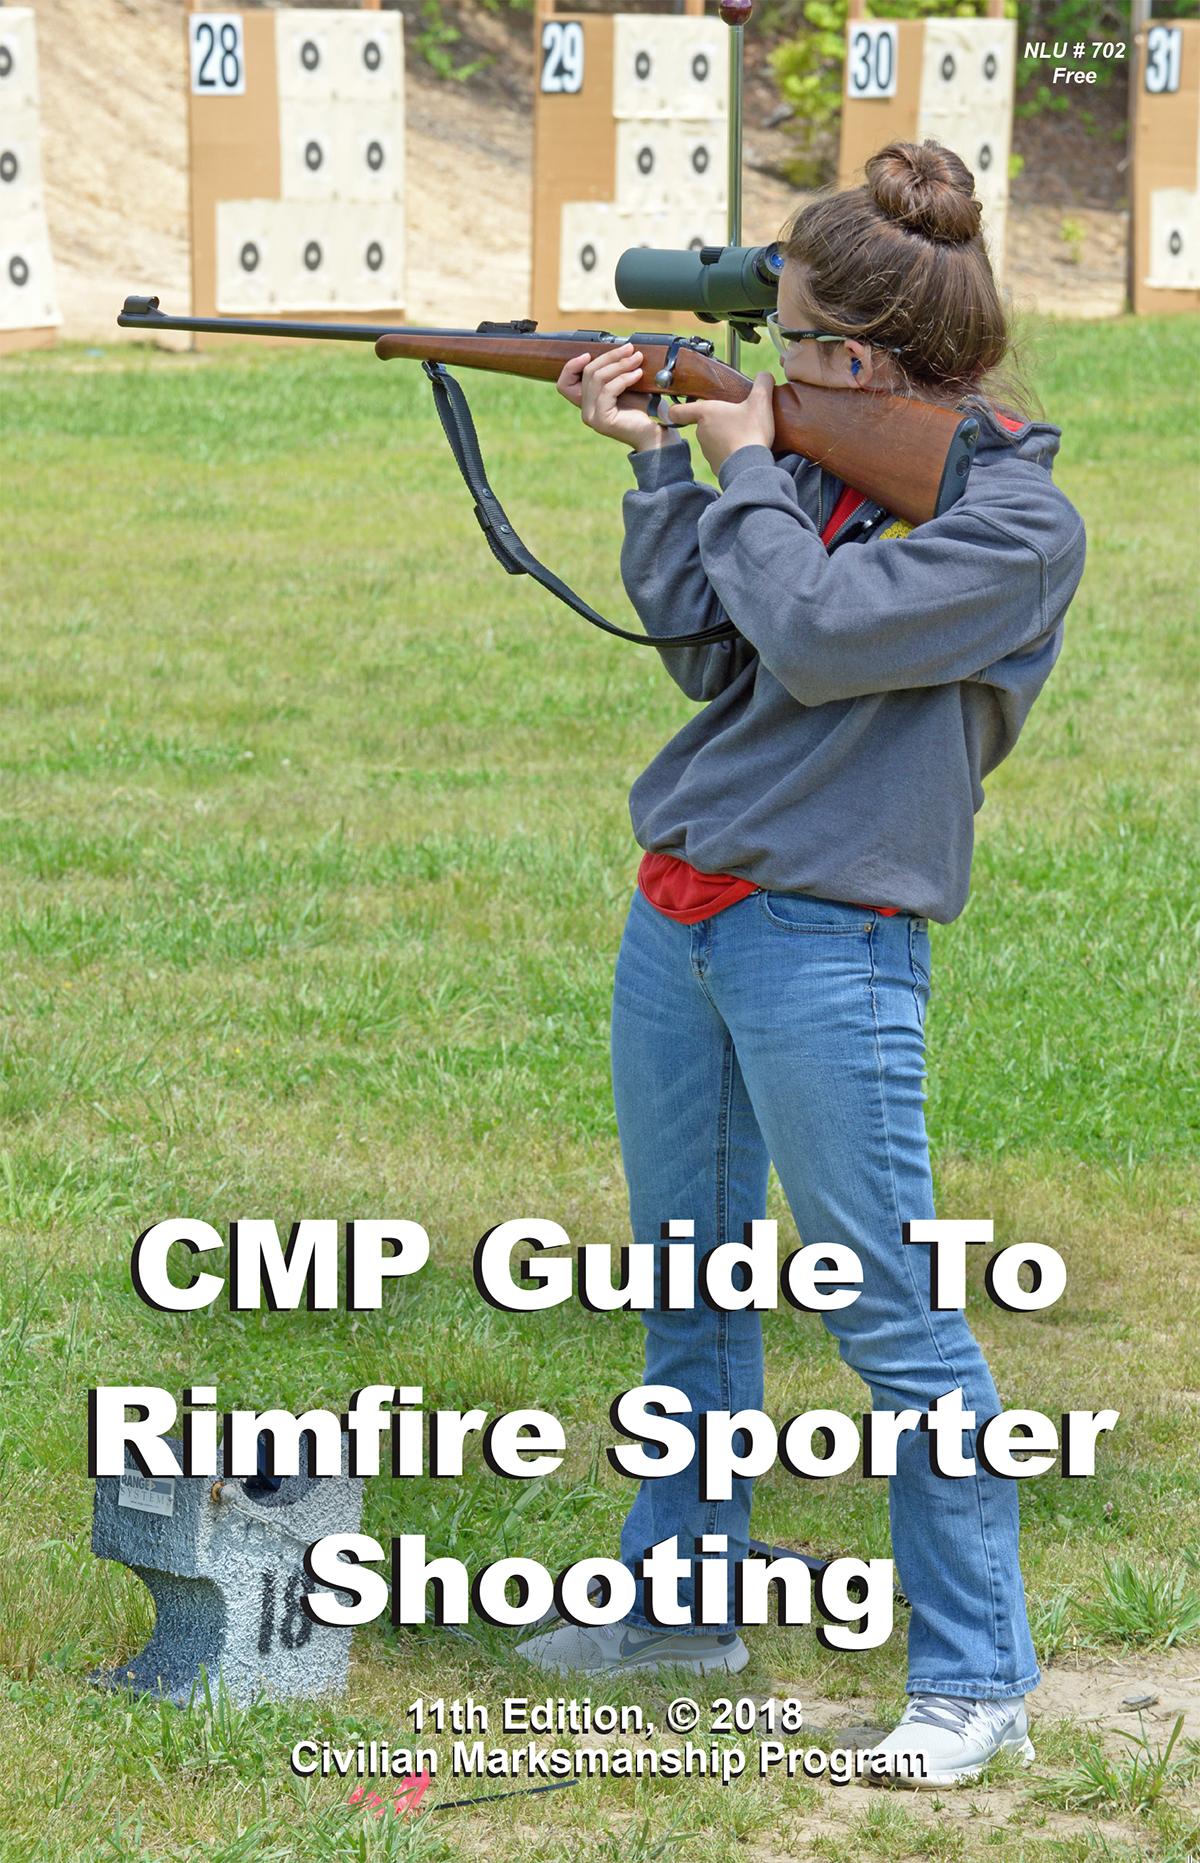 Rimfire Sporter - Civilian Marksmanship Program